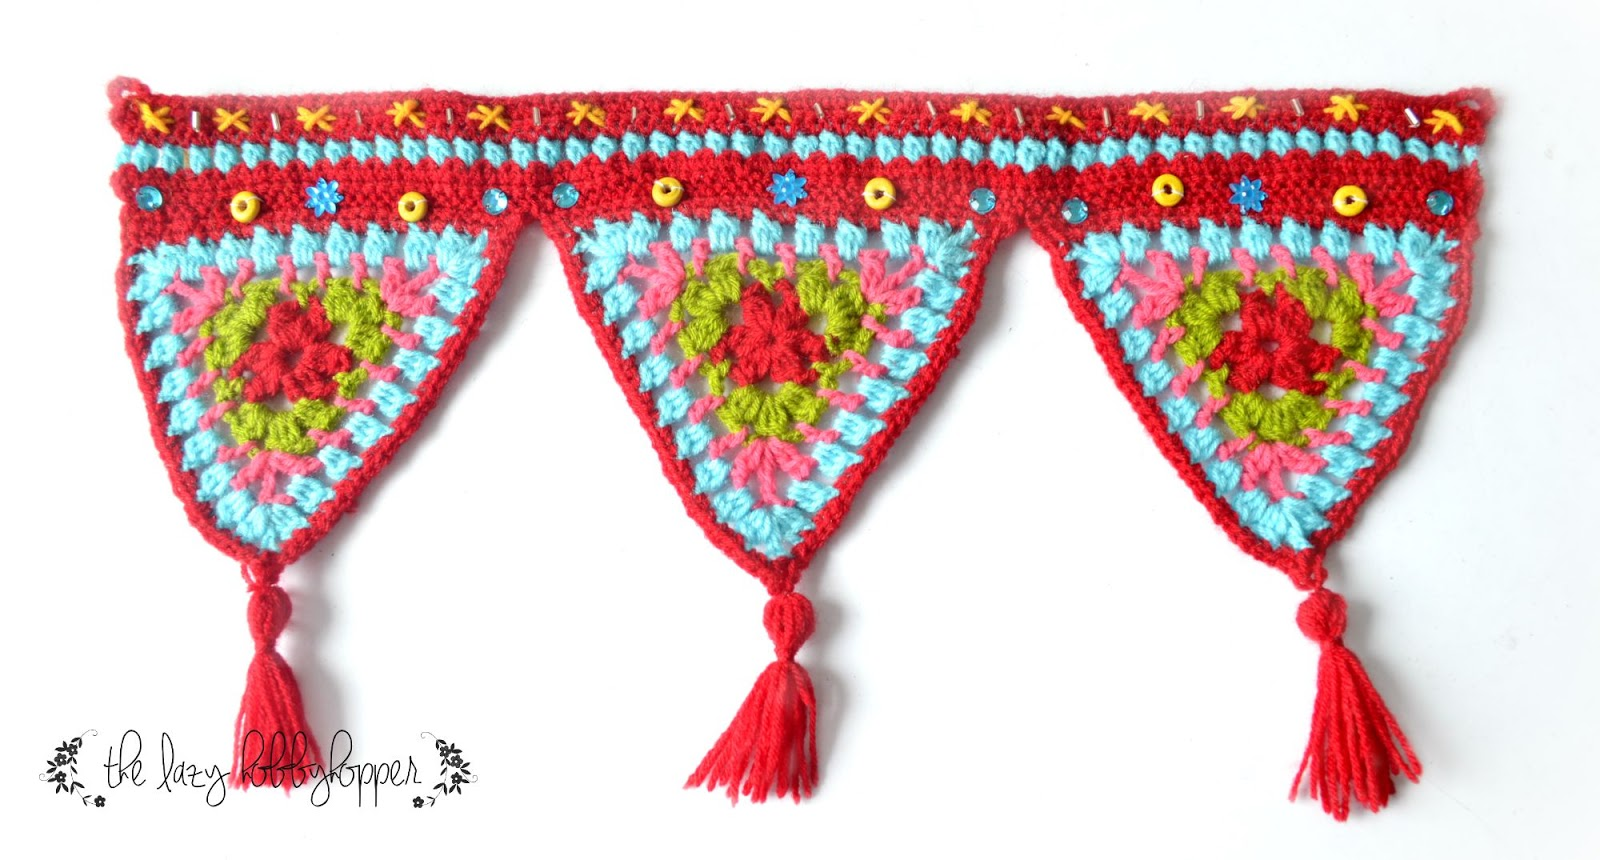 The Lazy Hobbyhopper Crochet Triangles Wall Hanging